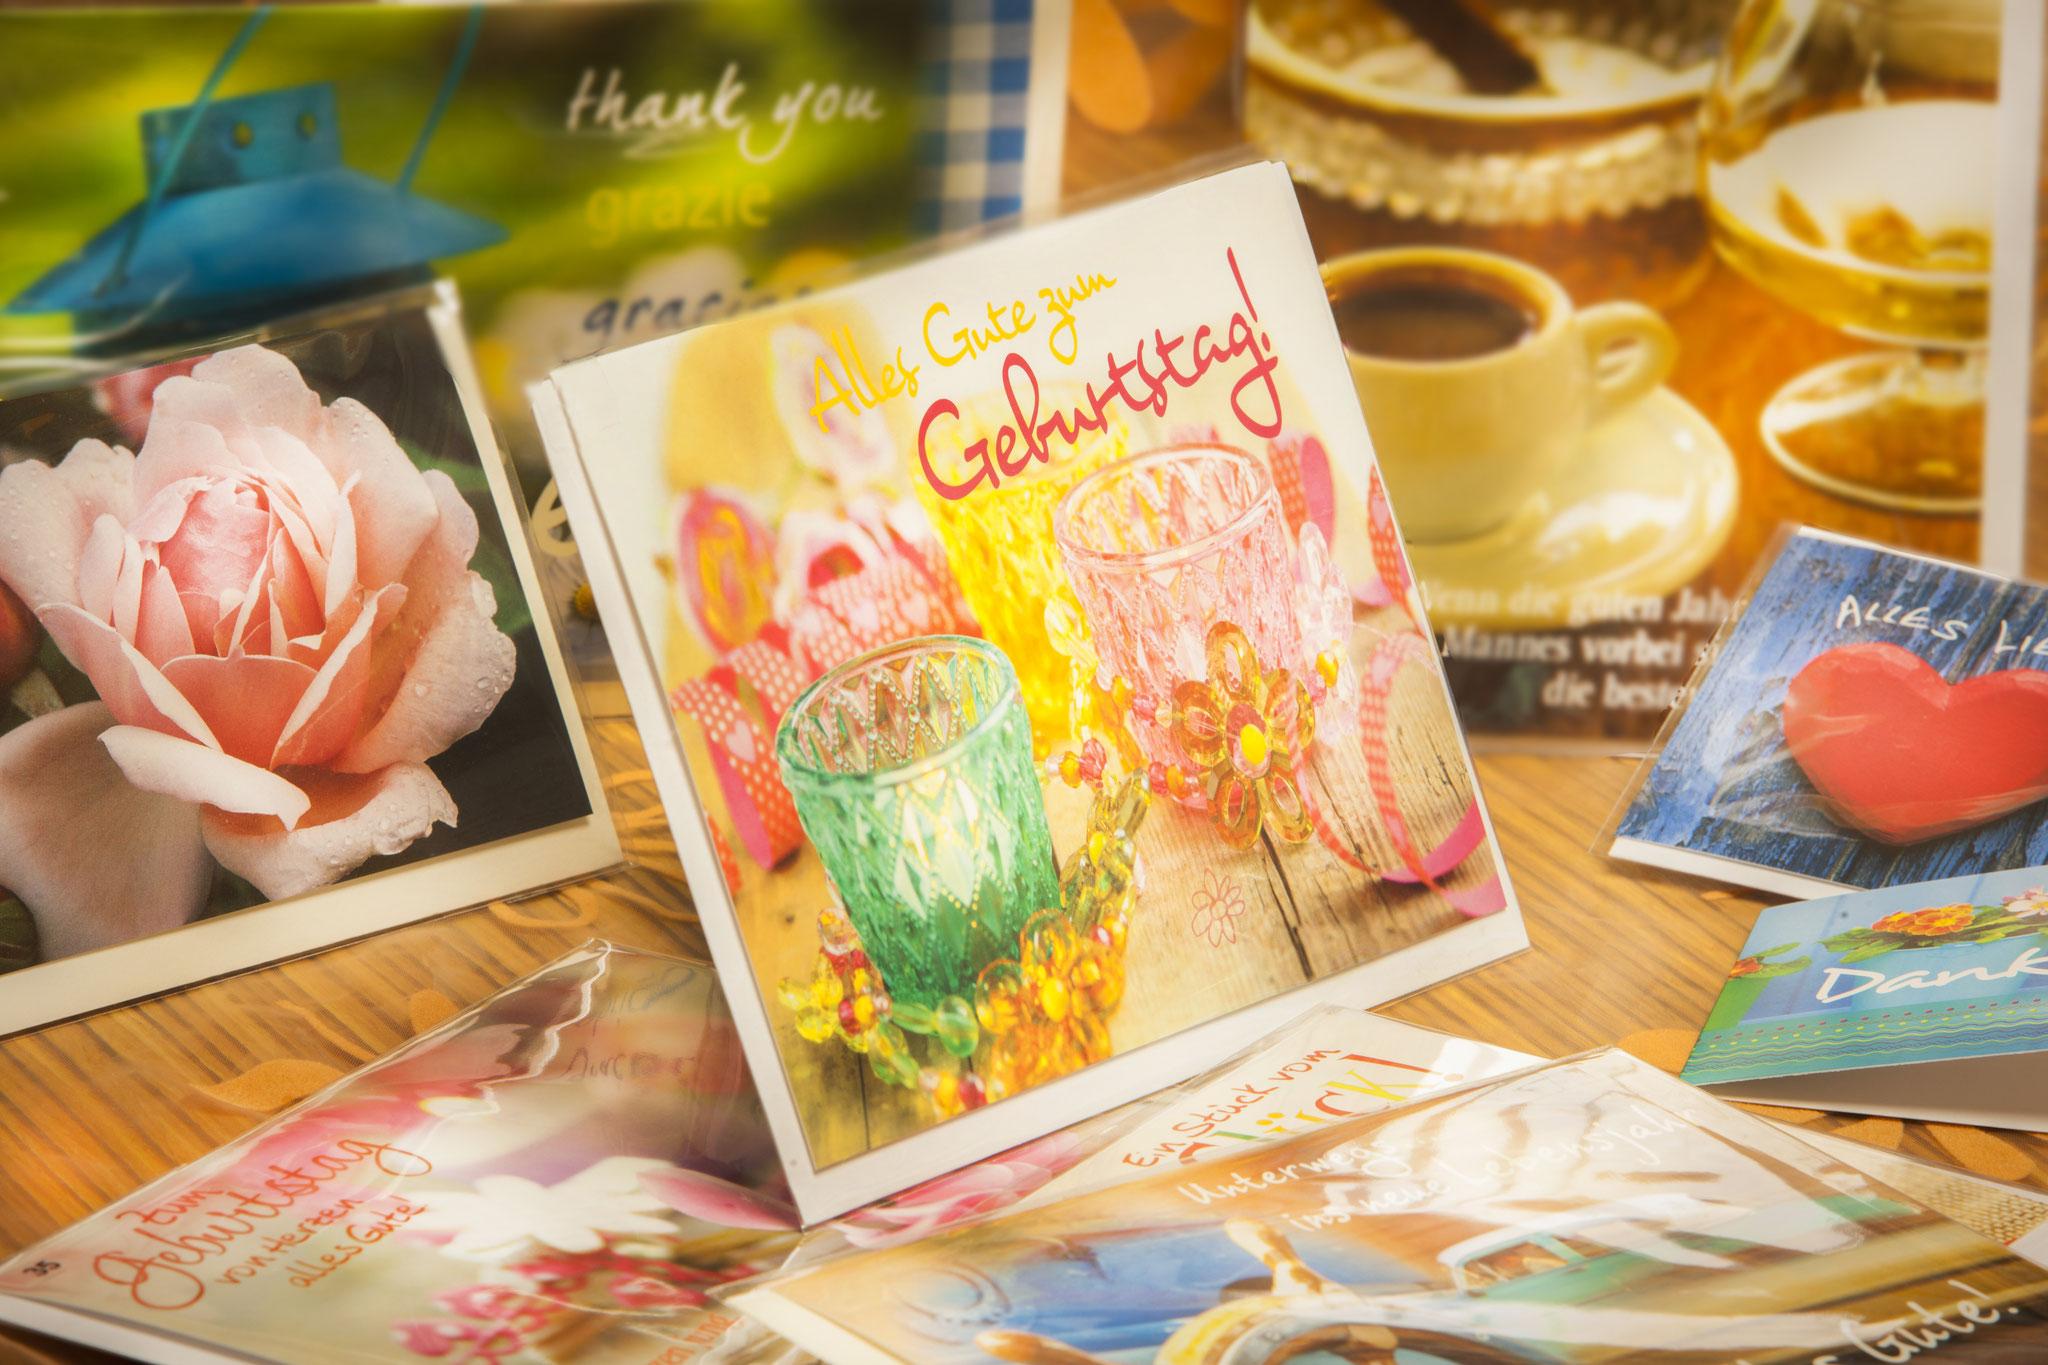 Glückwunschkarten Postkarten bei Ottmann in Sulzbach-Rosenberg